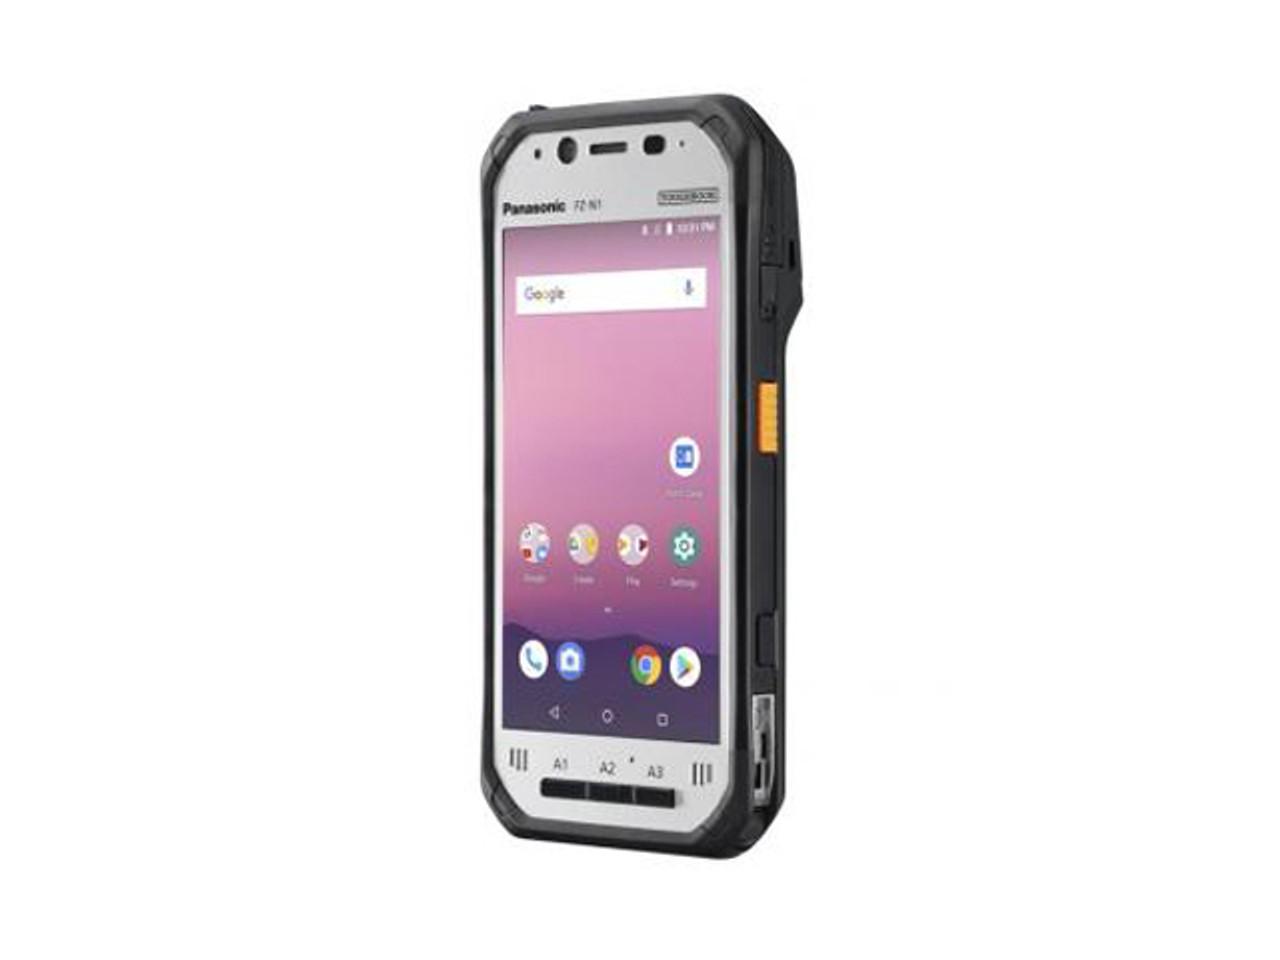 "Panasonic FZ-N1, 4.7"" HD Gloved Multi-Touch, Qualcomm Snapdragon msm8974ab (2.3GHz, Quad-Core), 2GB, 16GB, WiFi , Bluetooth, 4G LTE AT&T/VERIZON micro(Voice/Data) , Webcam, 8MP cam, NFC, 2D Bar (se4750), no drive - FZ-N1ABCAZZM"